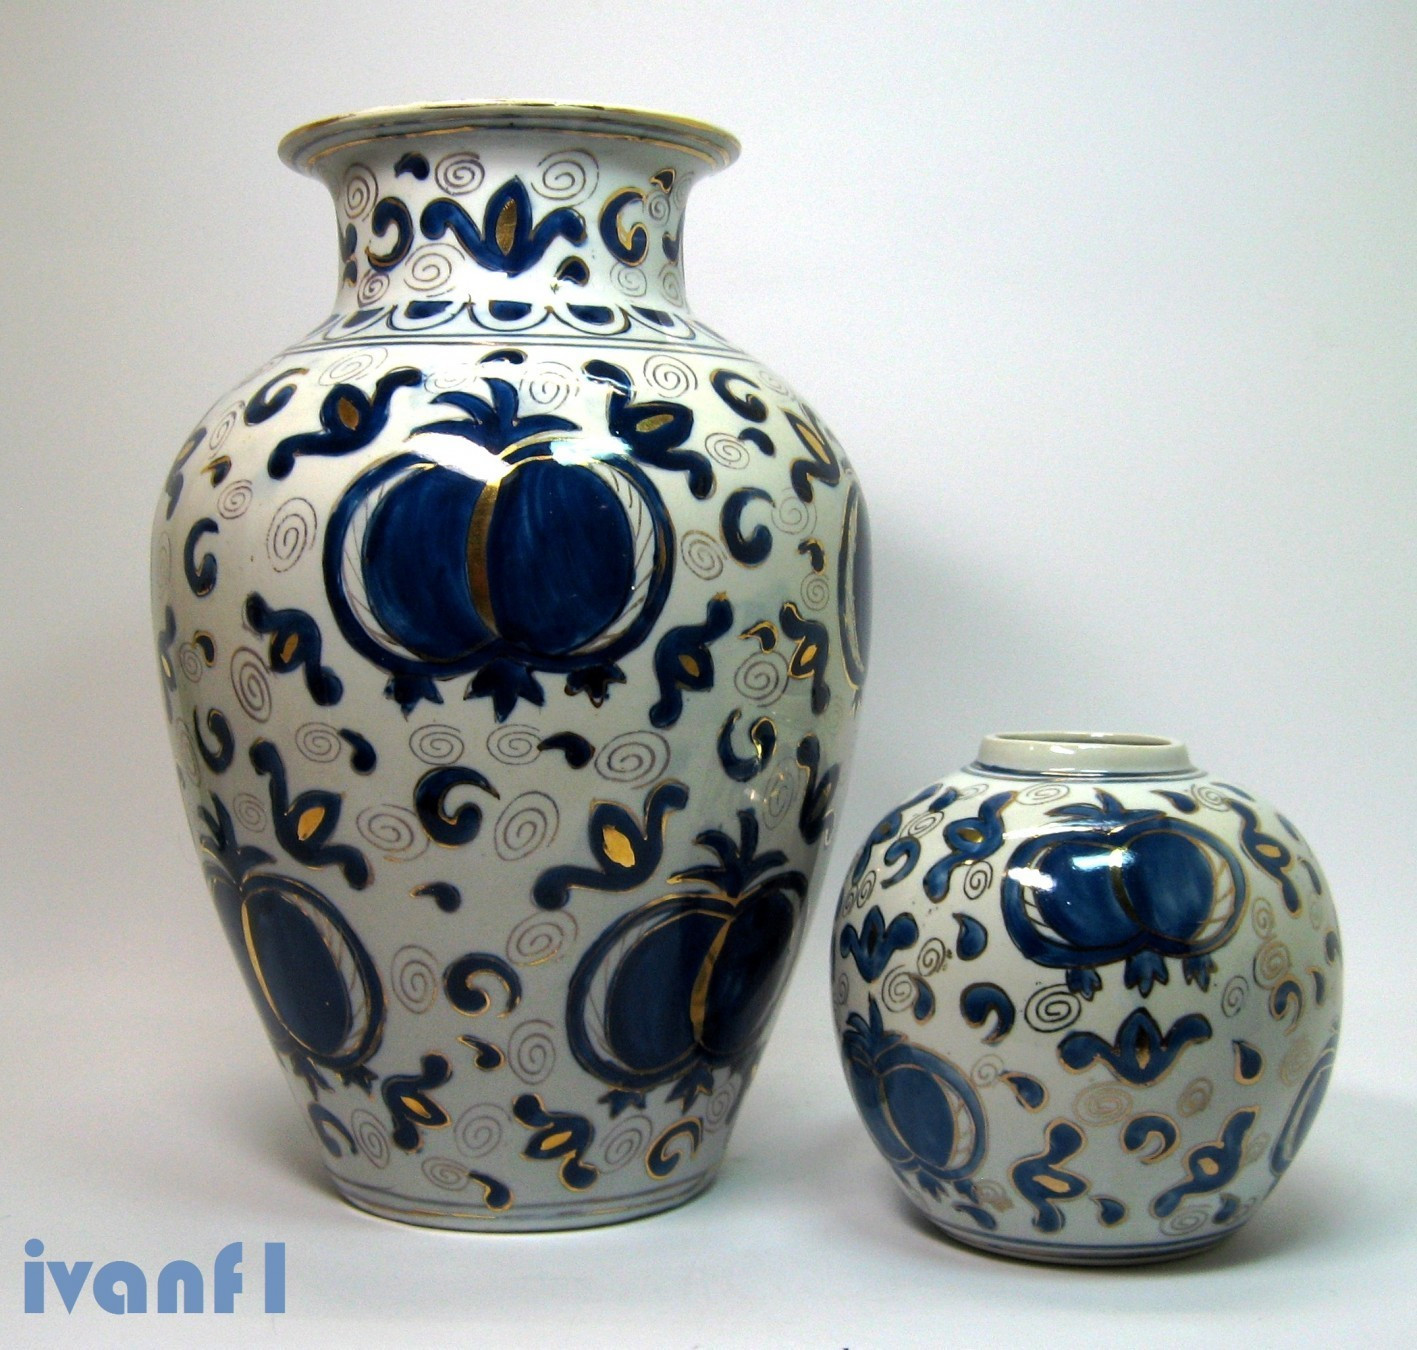 satsuma porcelain vase of dve kineske vaze satsuma replike kupindo com 38589439 within dve kineske vaze satsuma replike